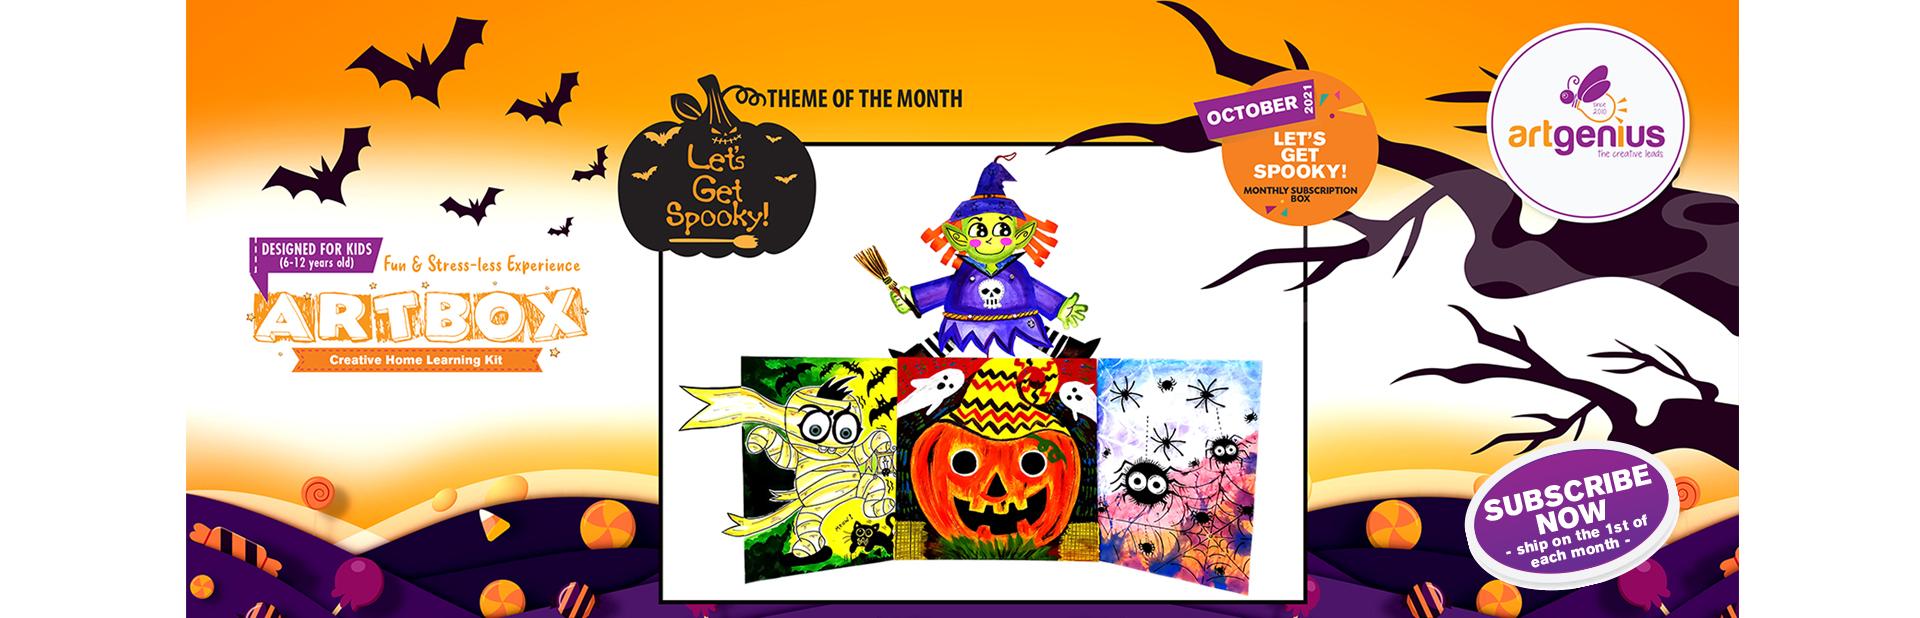 web-banner-oct-lets-get-spooky